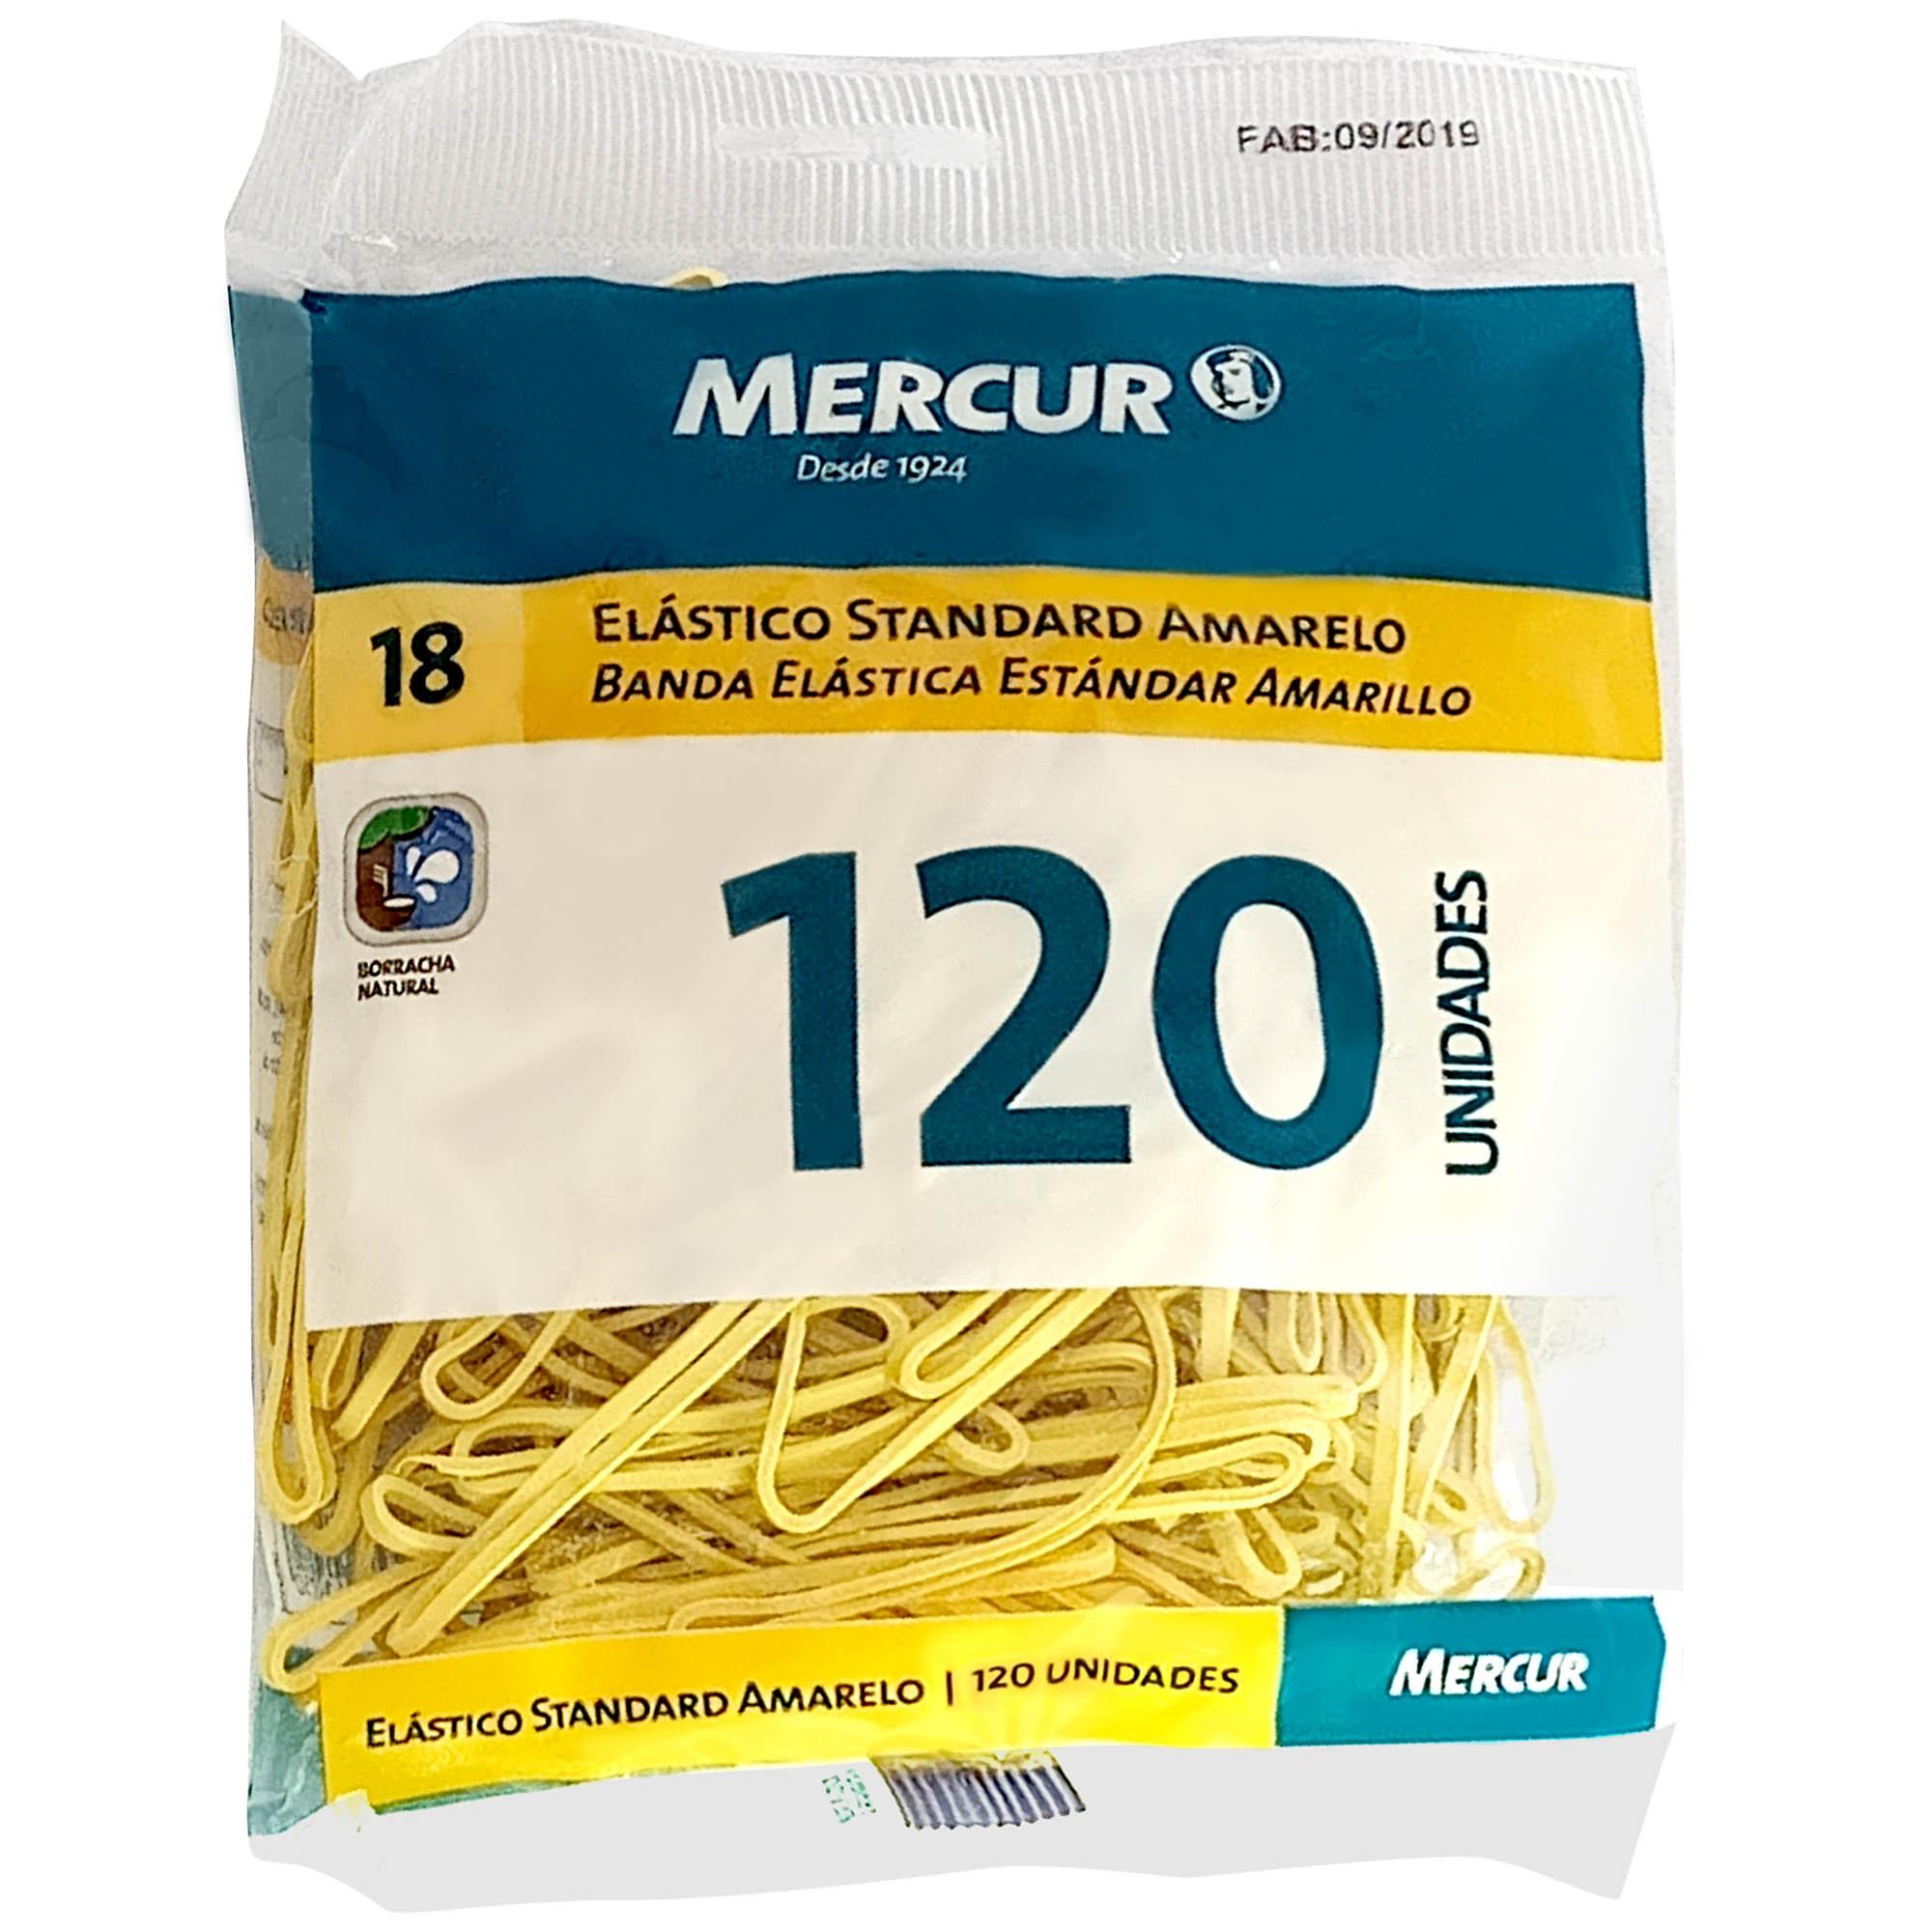 Elastico Amarelo N.18 Standart 120 PCS UNIDADE B05040318-07 - Mercur